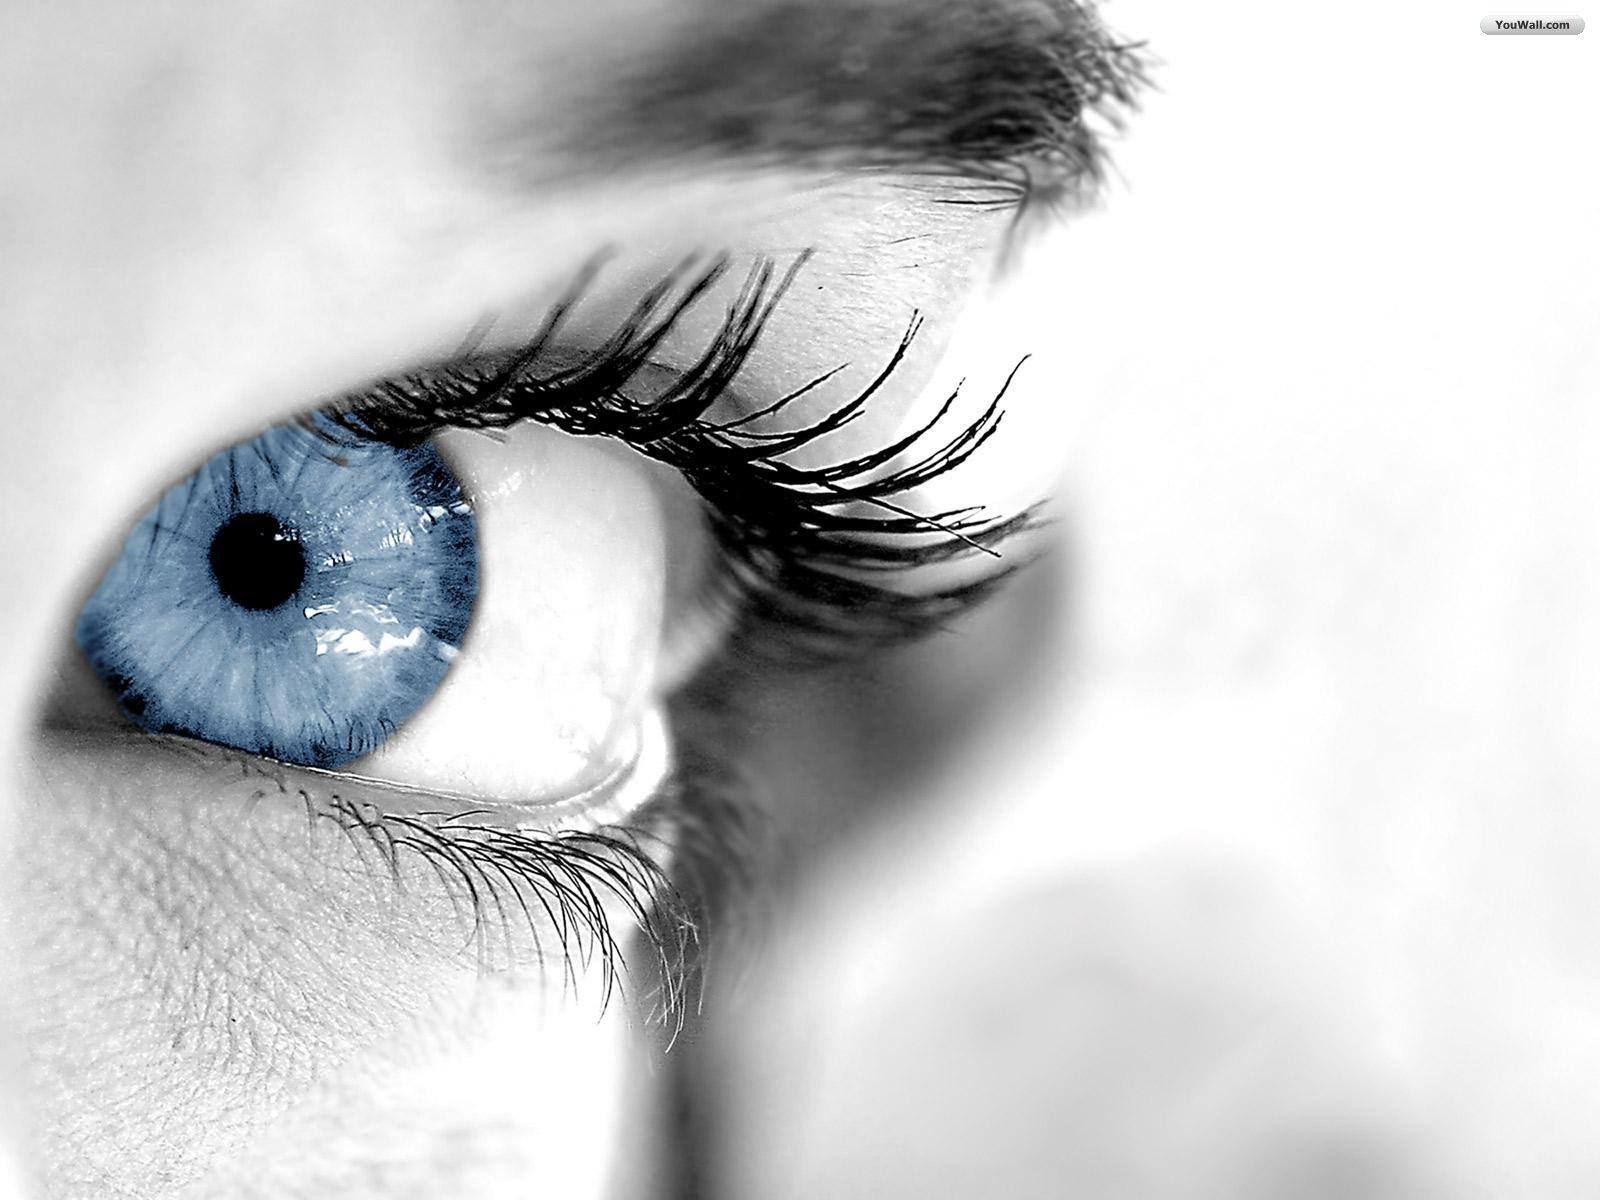 3D eye wallpaper Beautiful Acterss Wallpapers HD